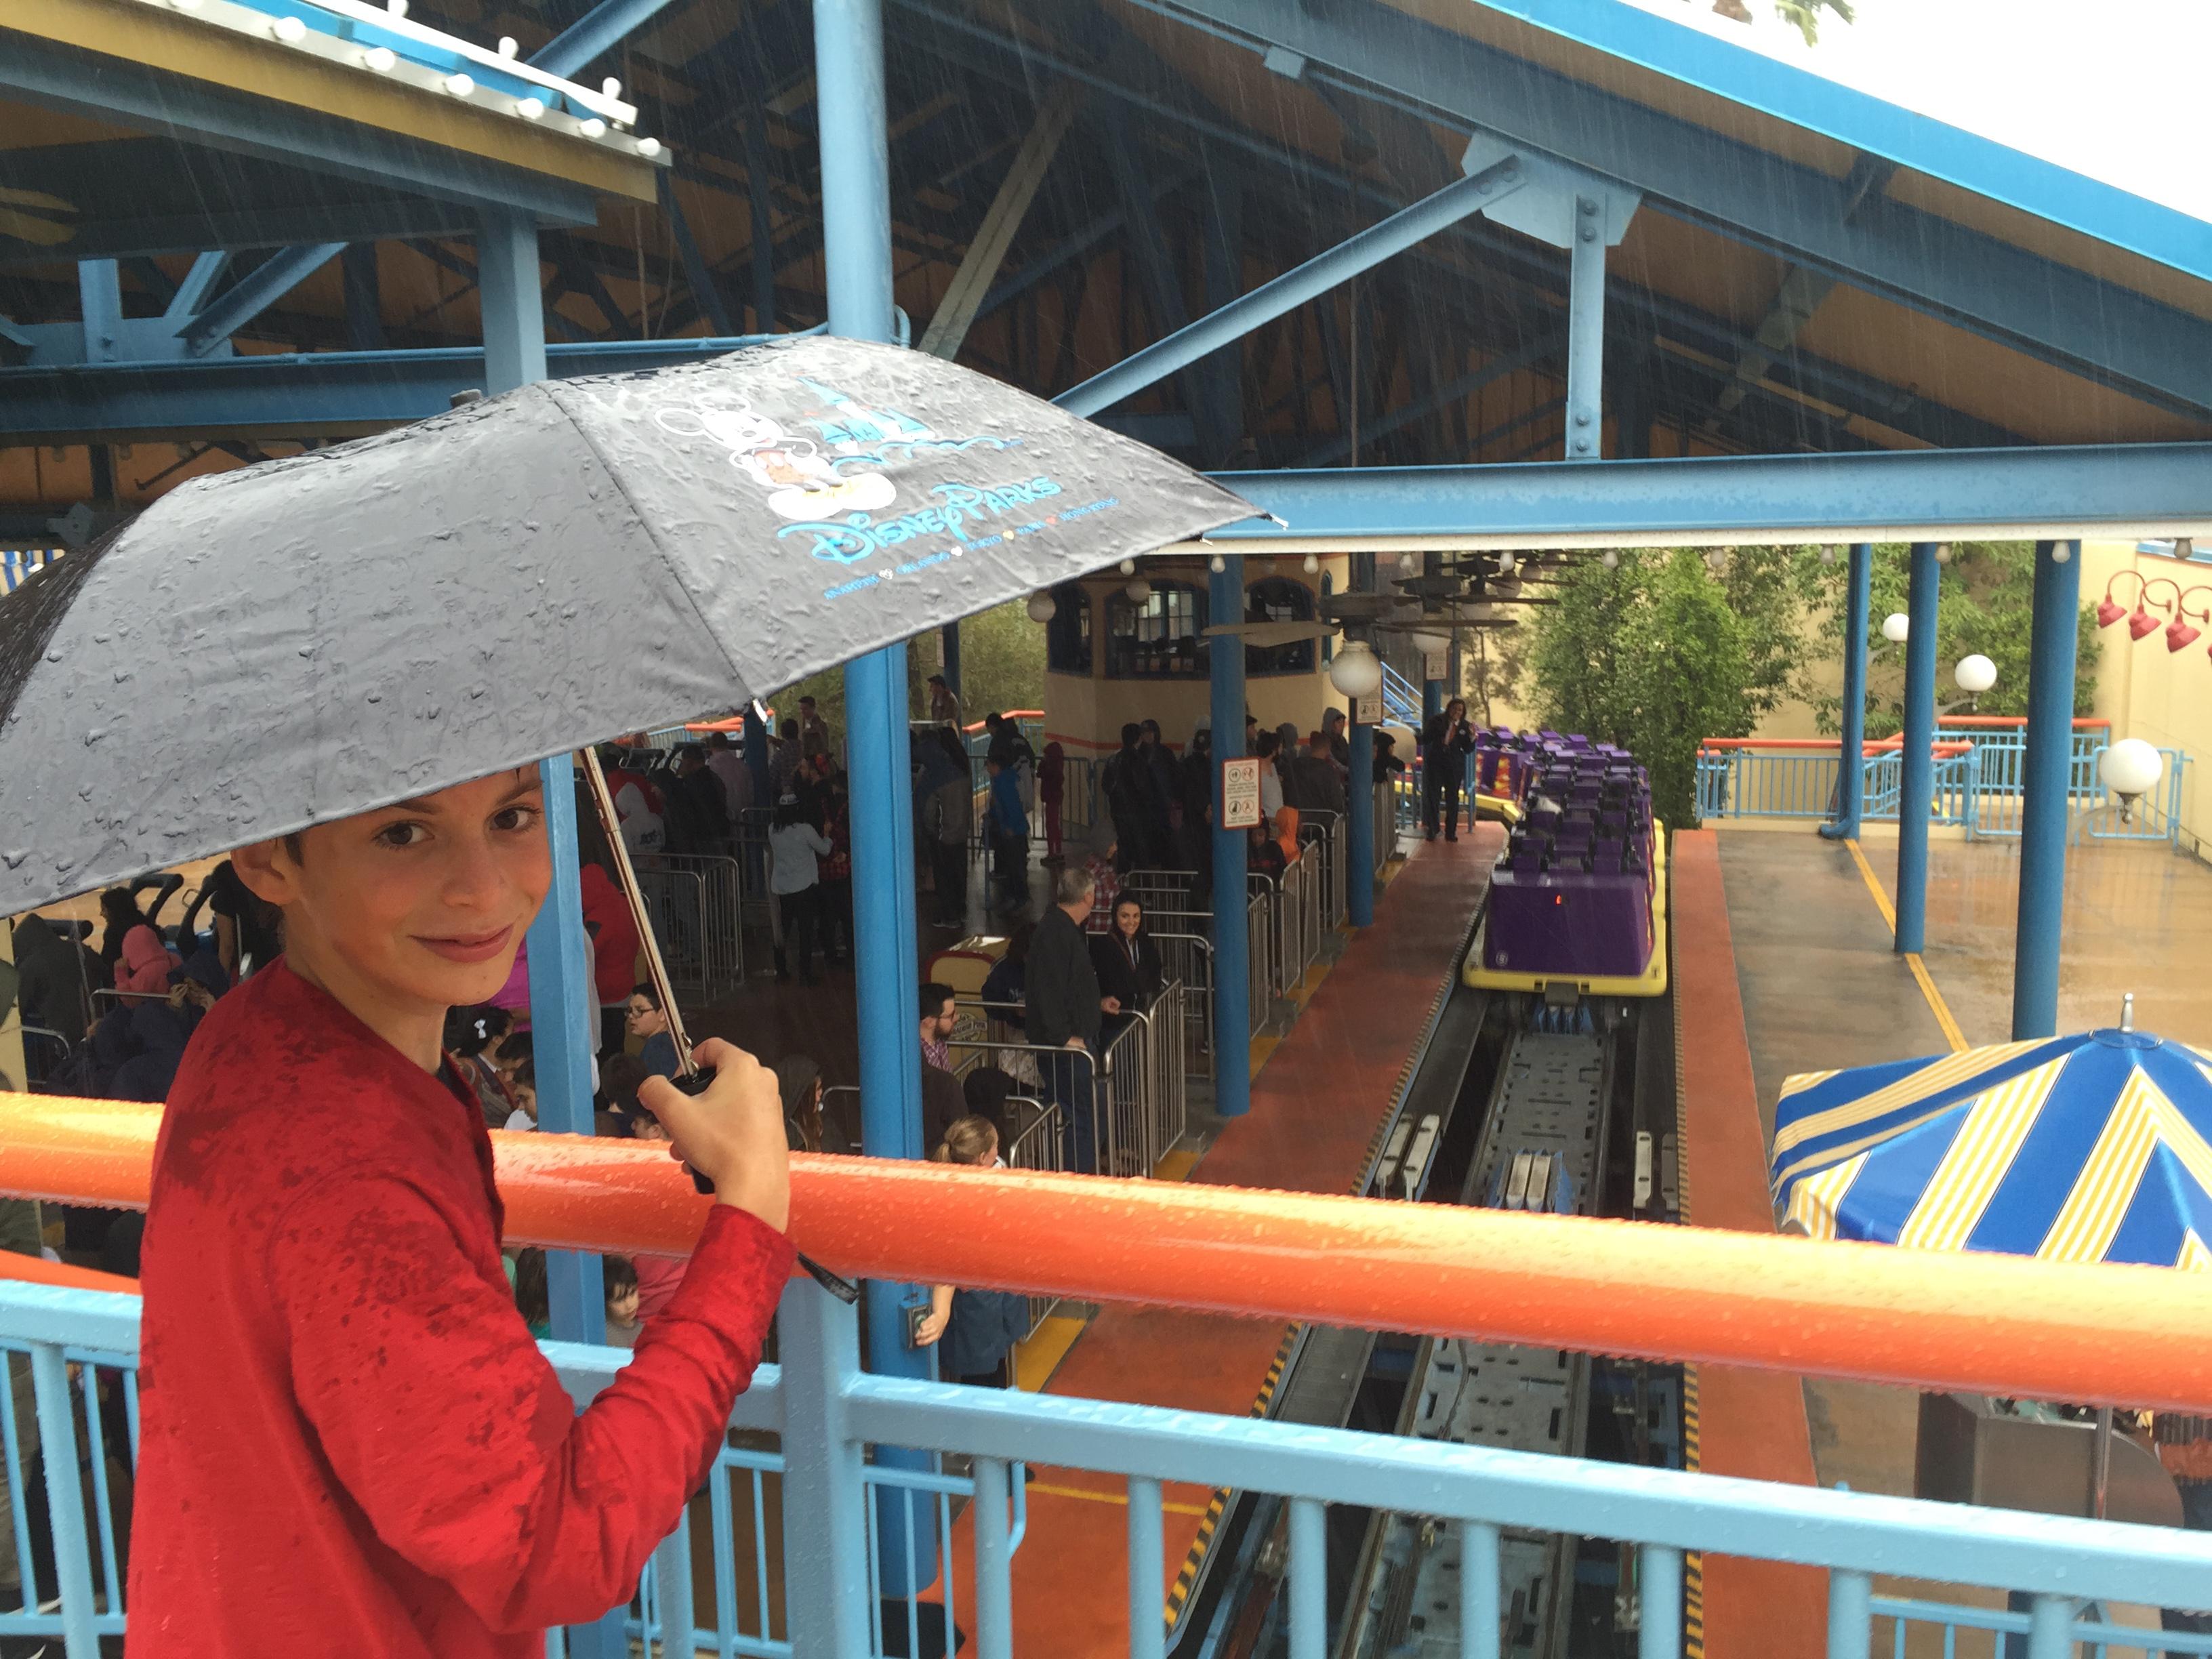 Bring it! Rainy Day fun at Disneyland. Tips to soak it all up.